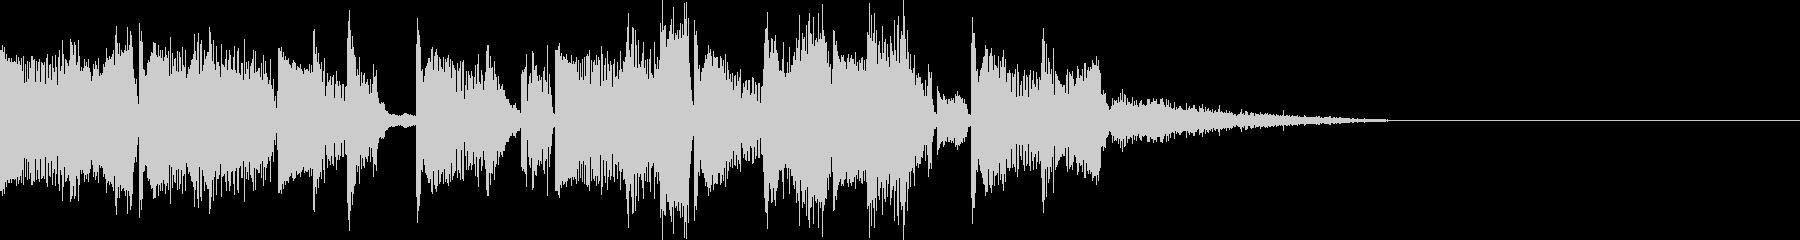 EDM風ハウスジングルの未再生の波形